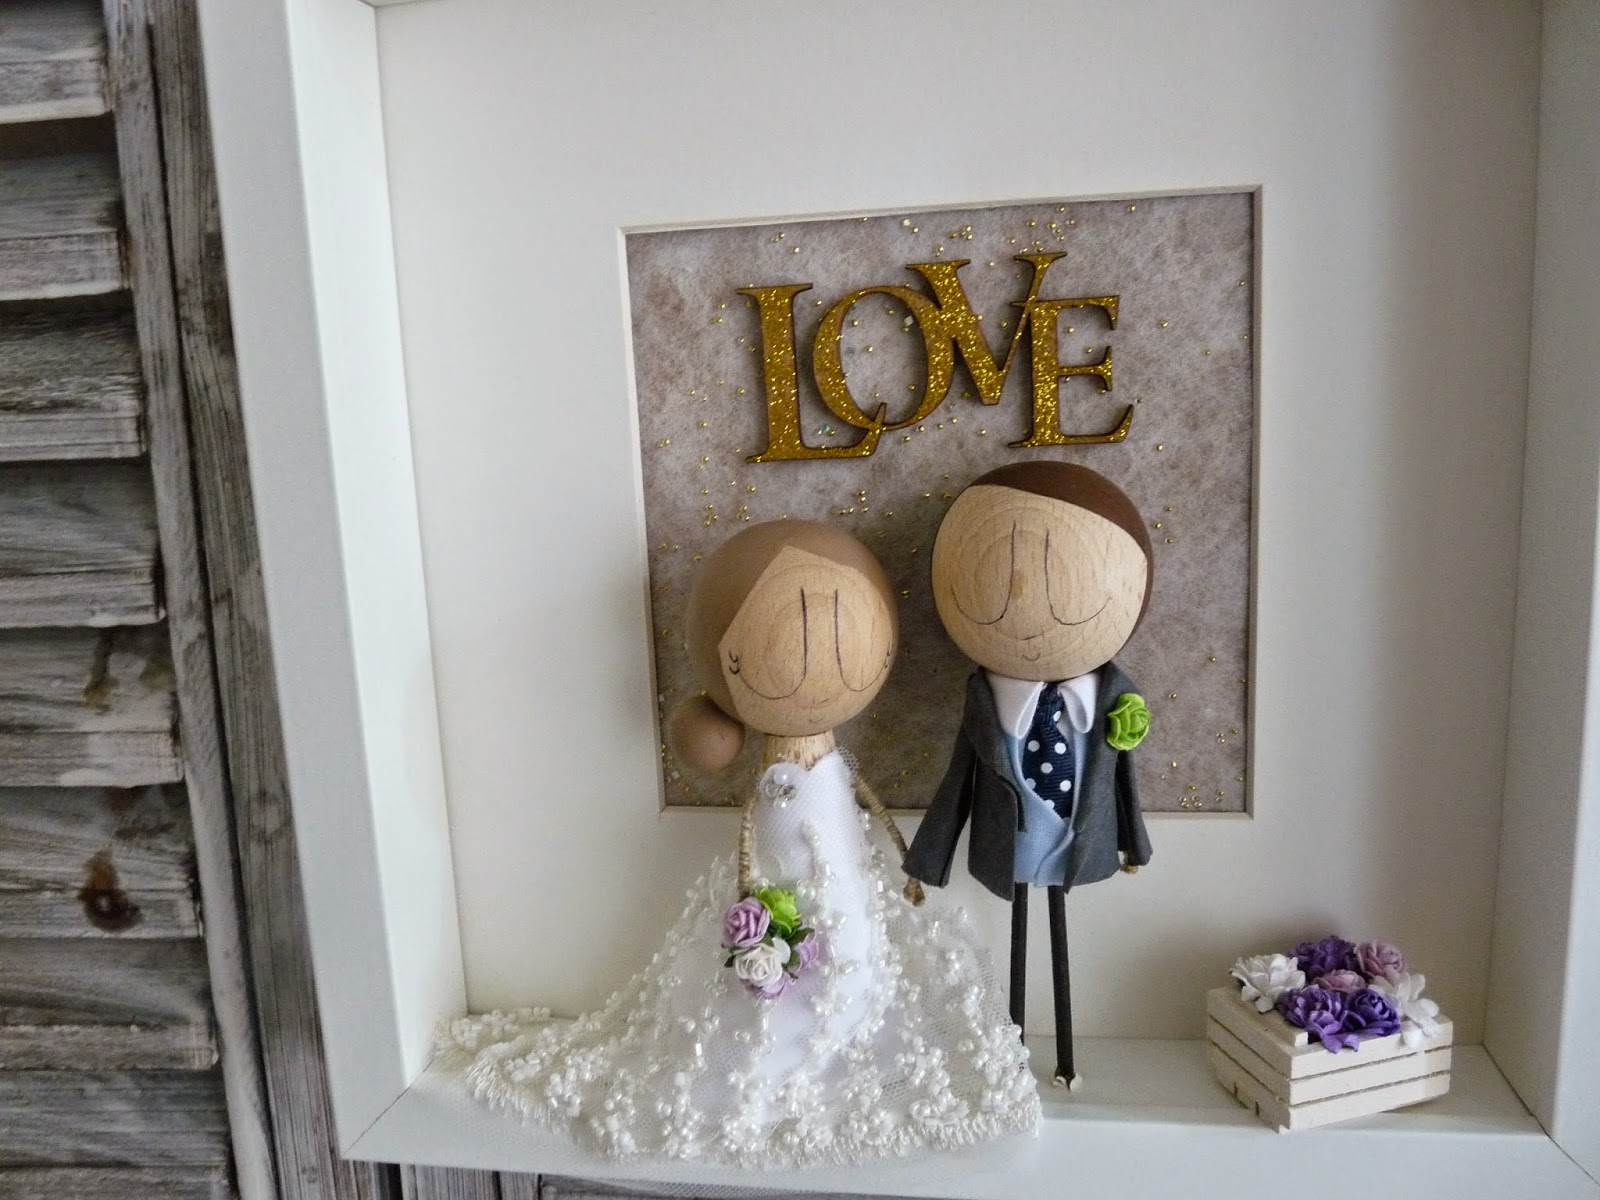 bodas, novios personalizados, love, bodas barcelona, cuadros novios, novios pastel, novios tarta, wedding, topper cake wedding cake topper wedding, love, bodas con encanto